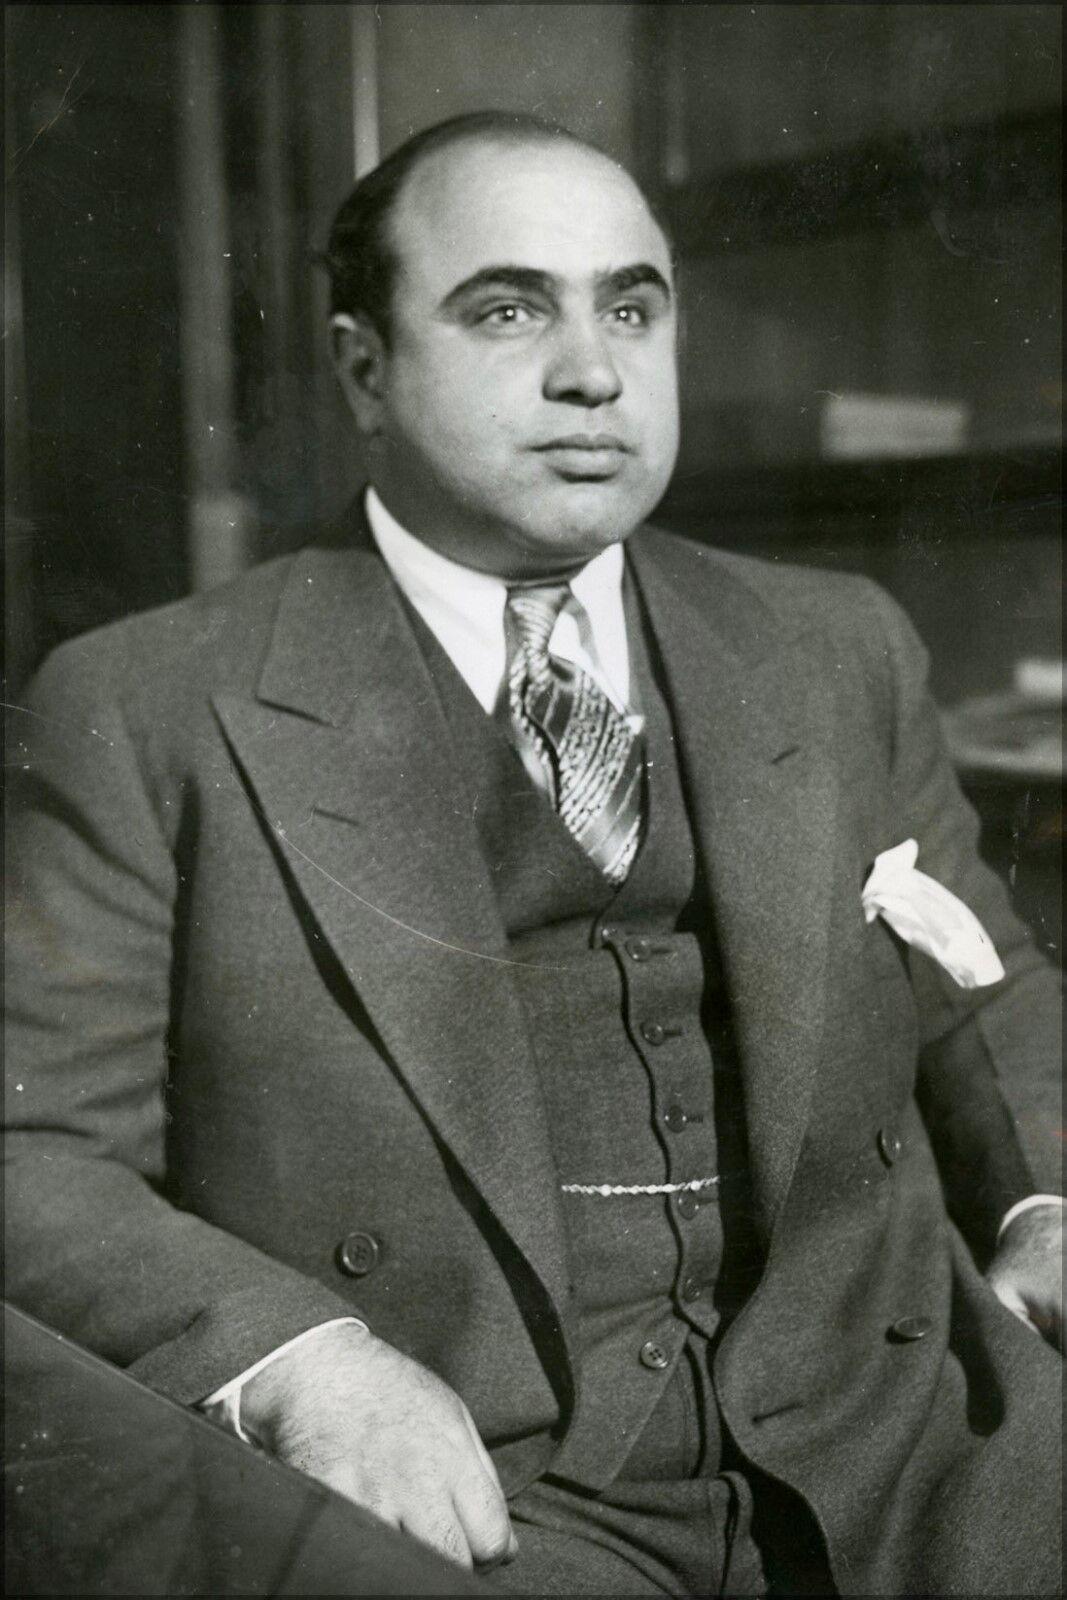 Plakat, Viele Größen; Al Capone in 1930